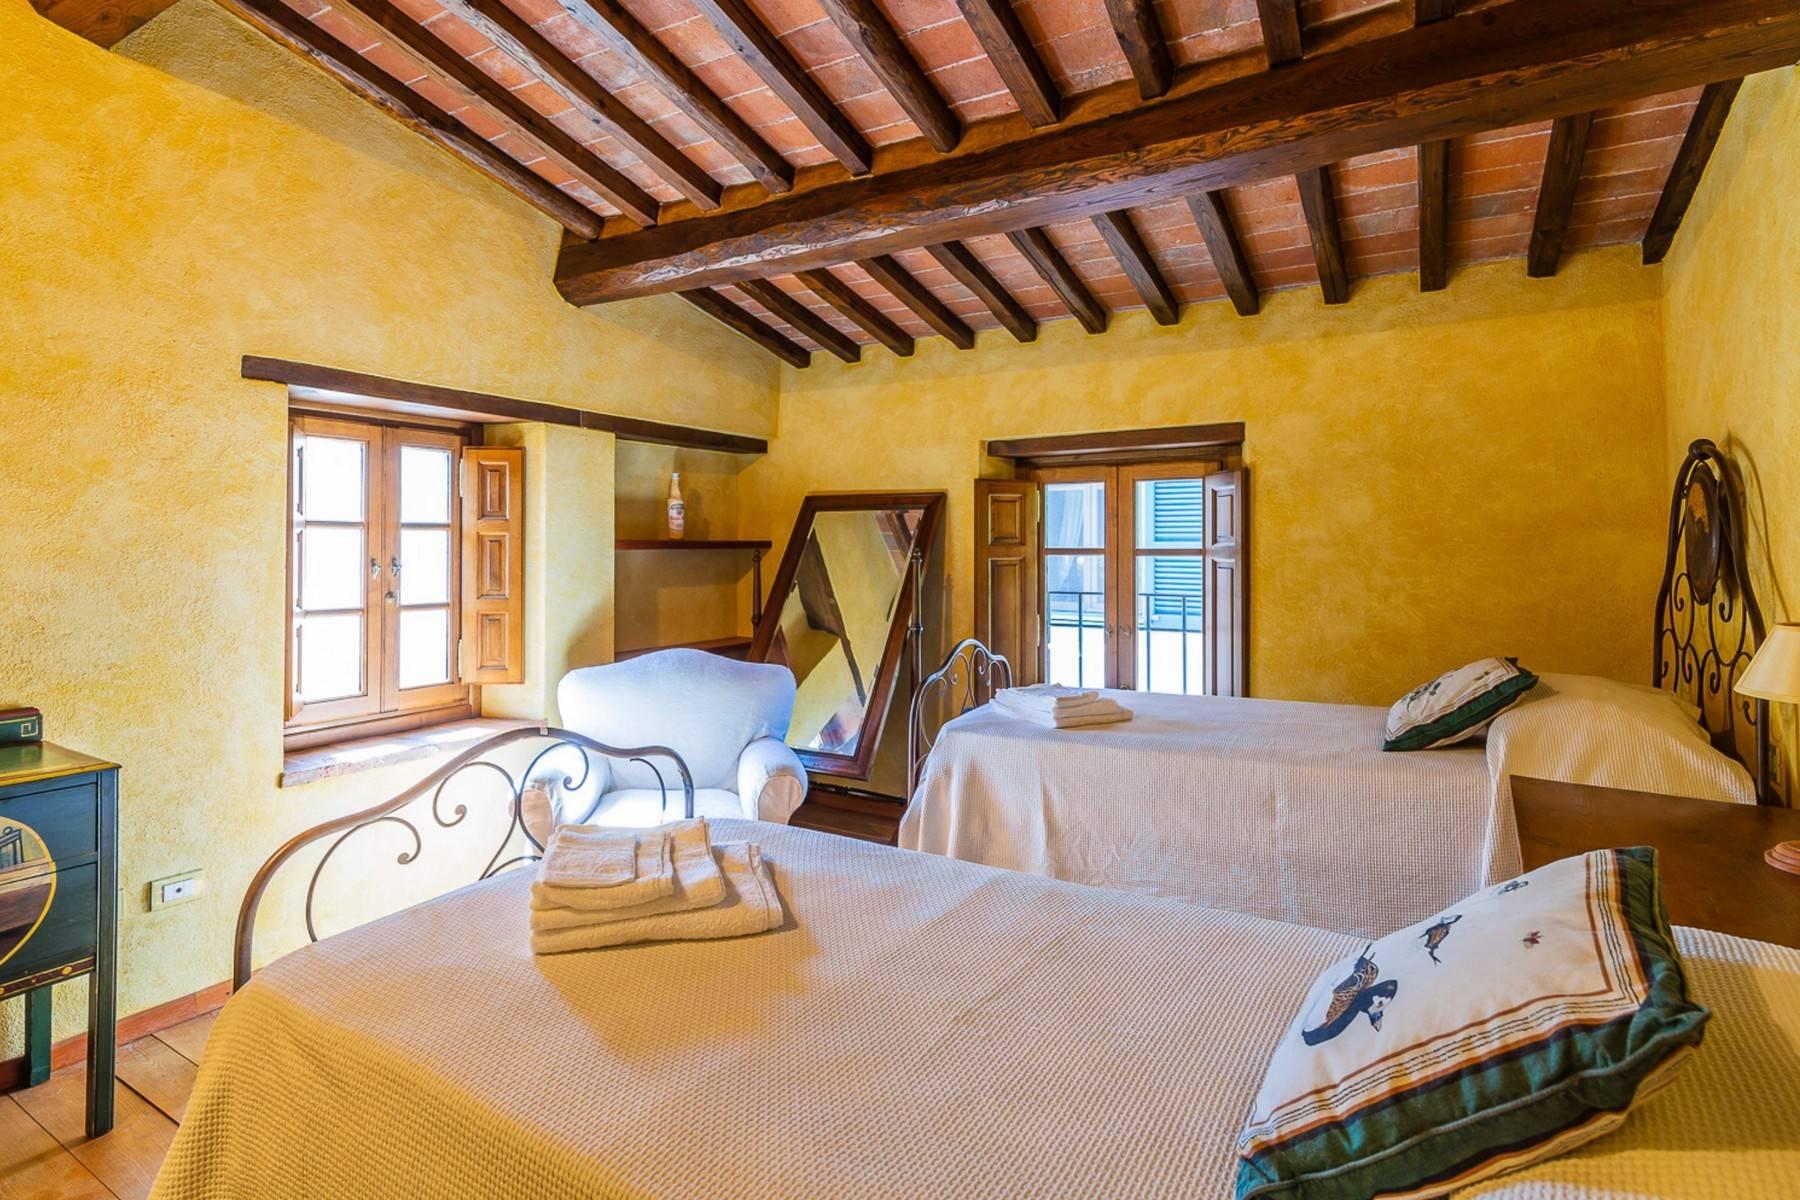 Villa in Vendita a Lucca: 5 locali, 1130 mq - Foto 21